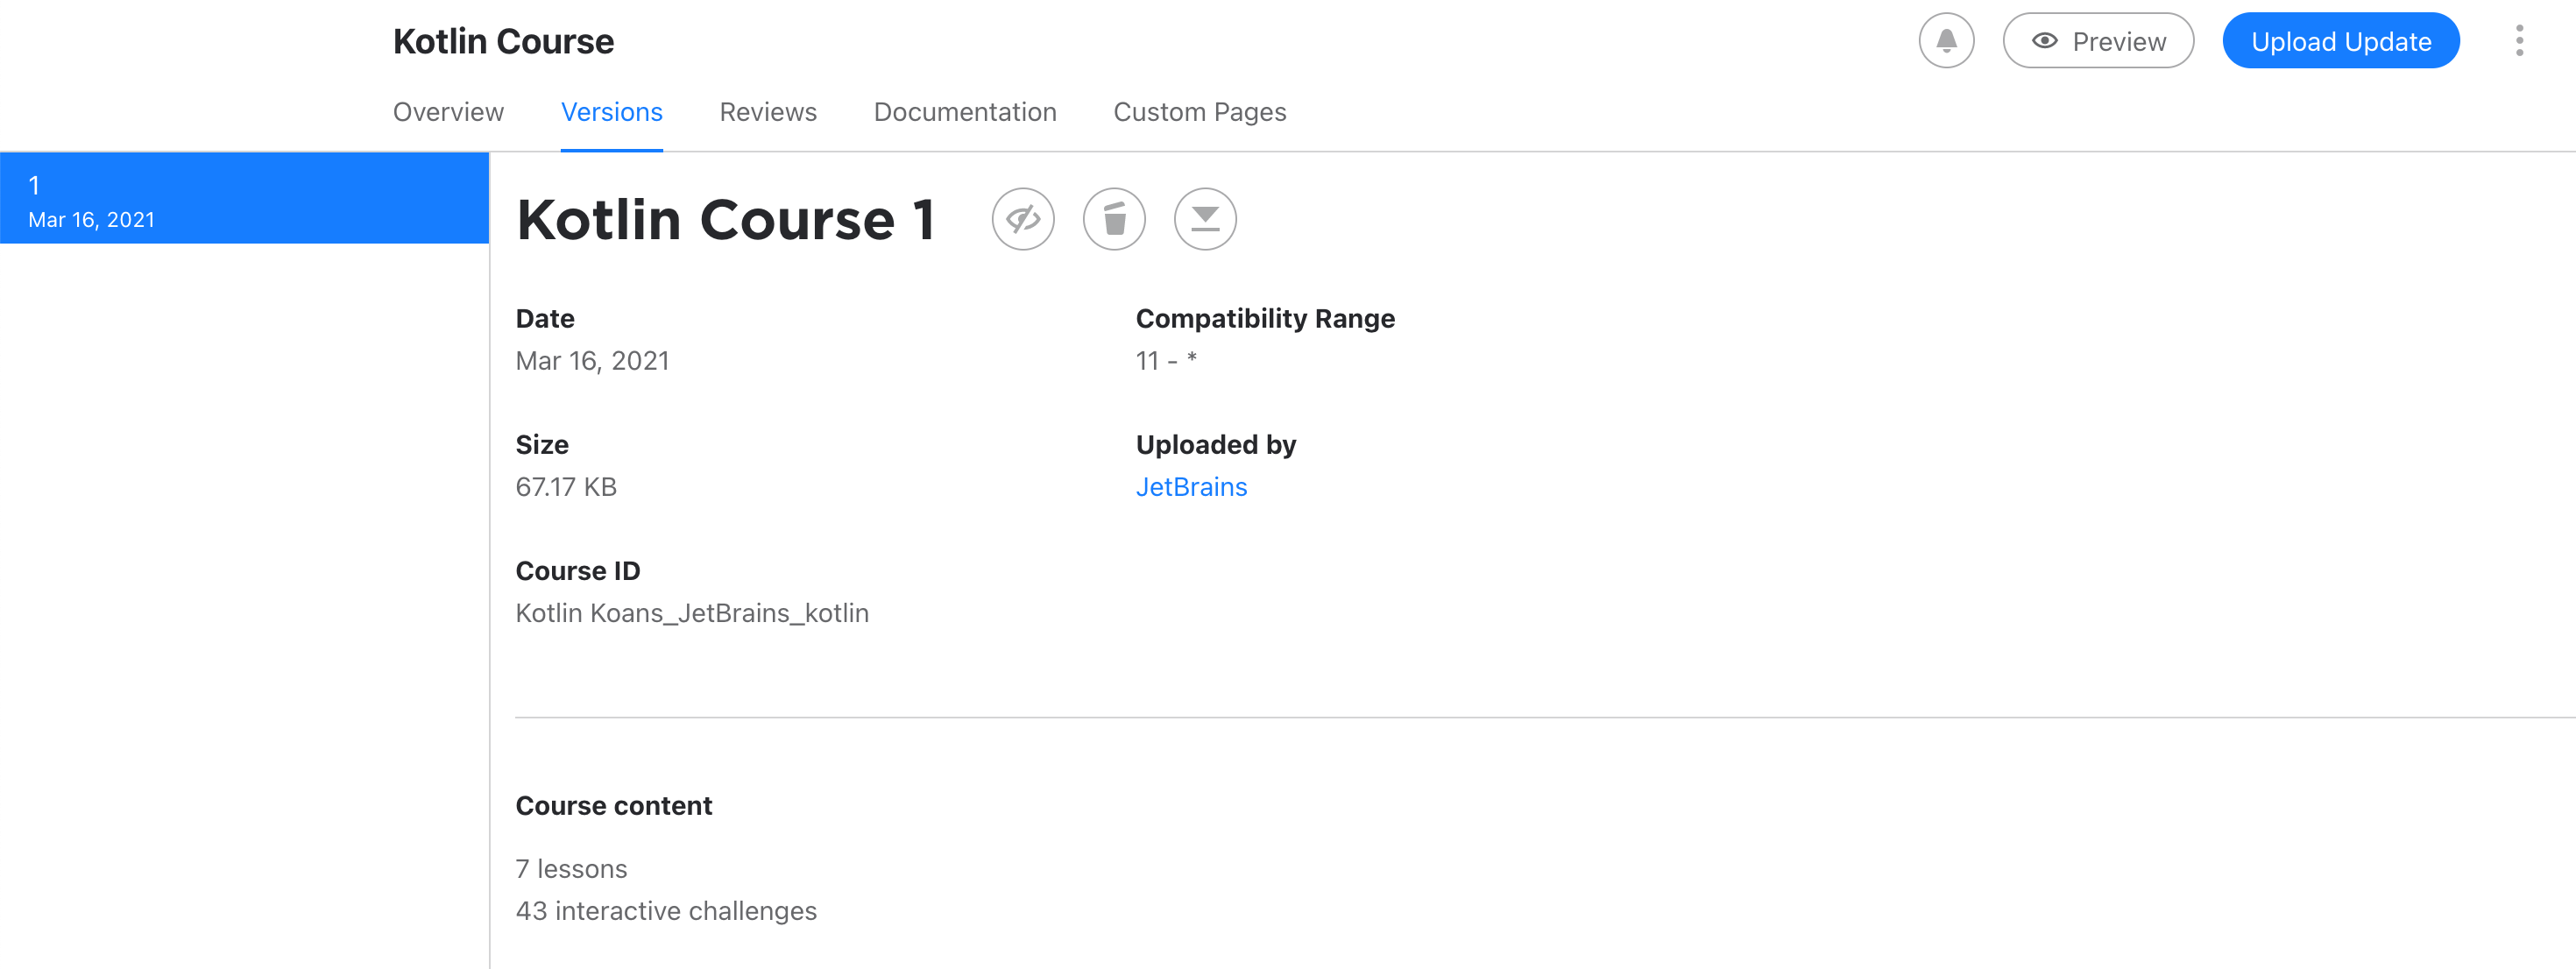 Edu courses at marketplace versions tab